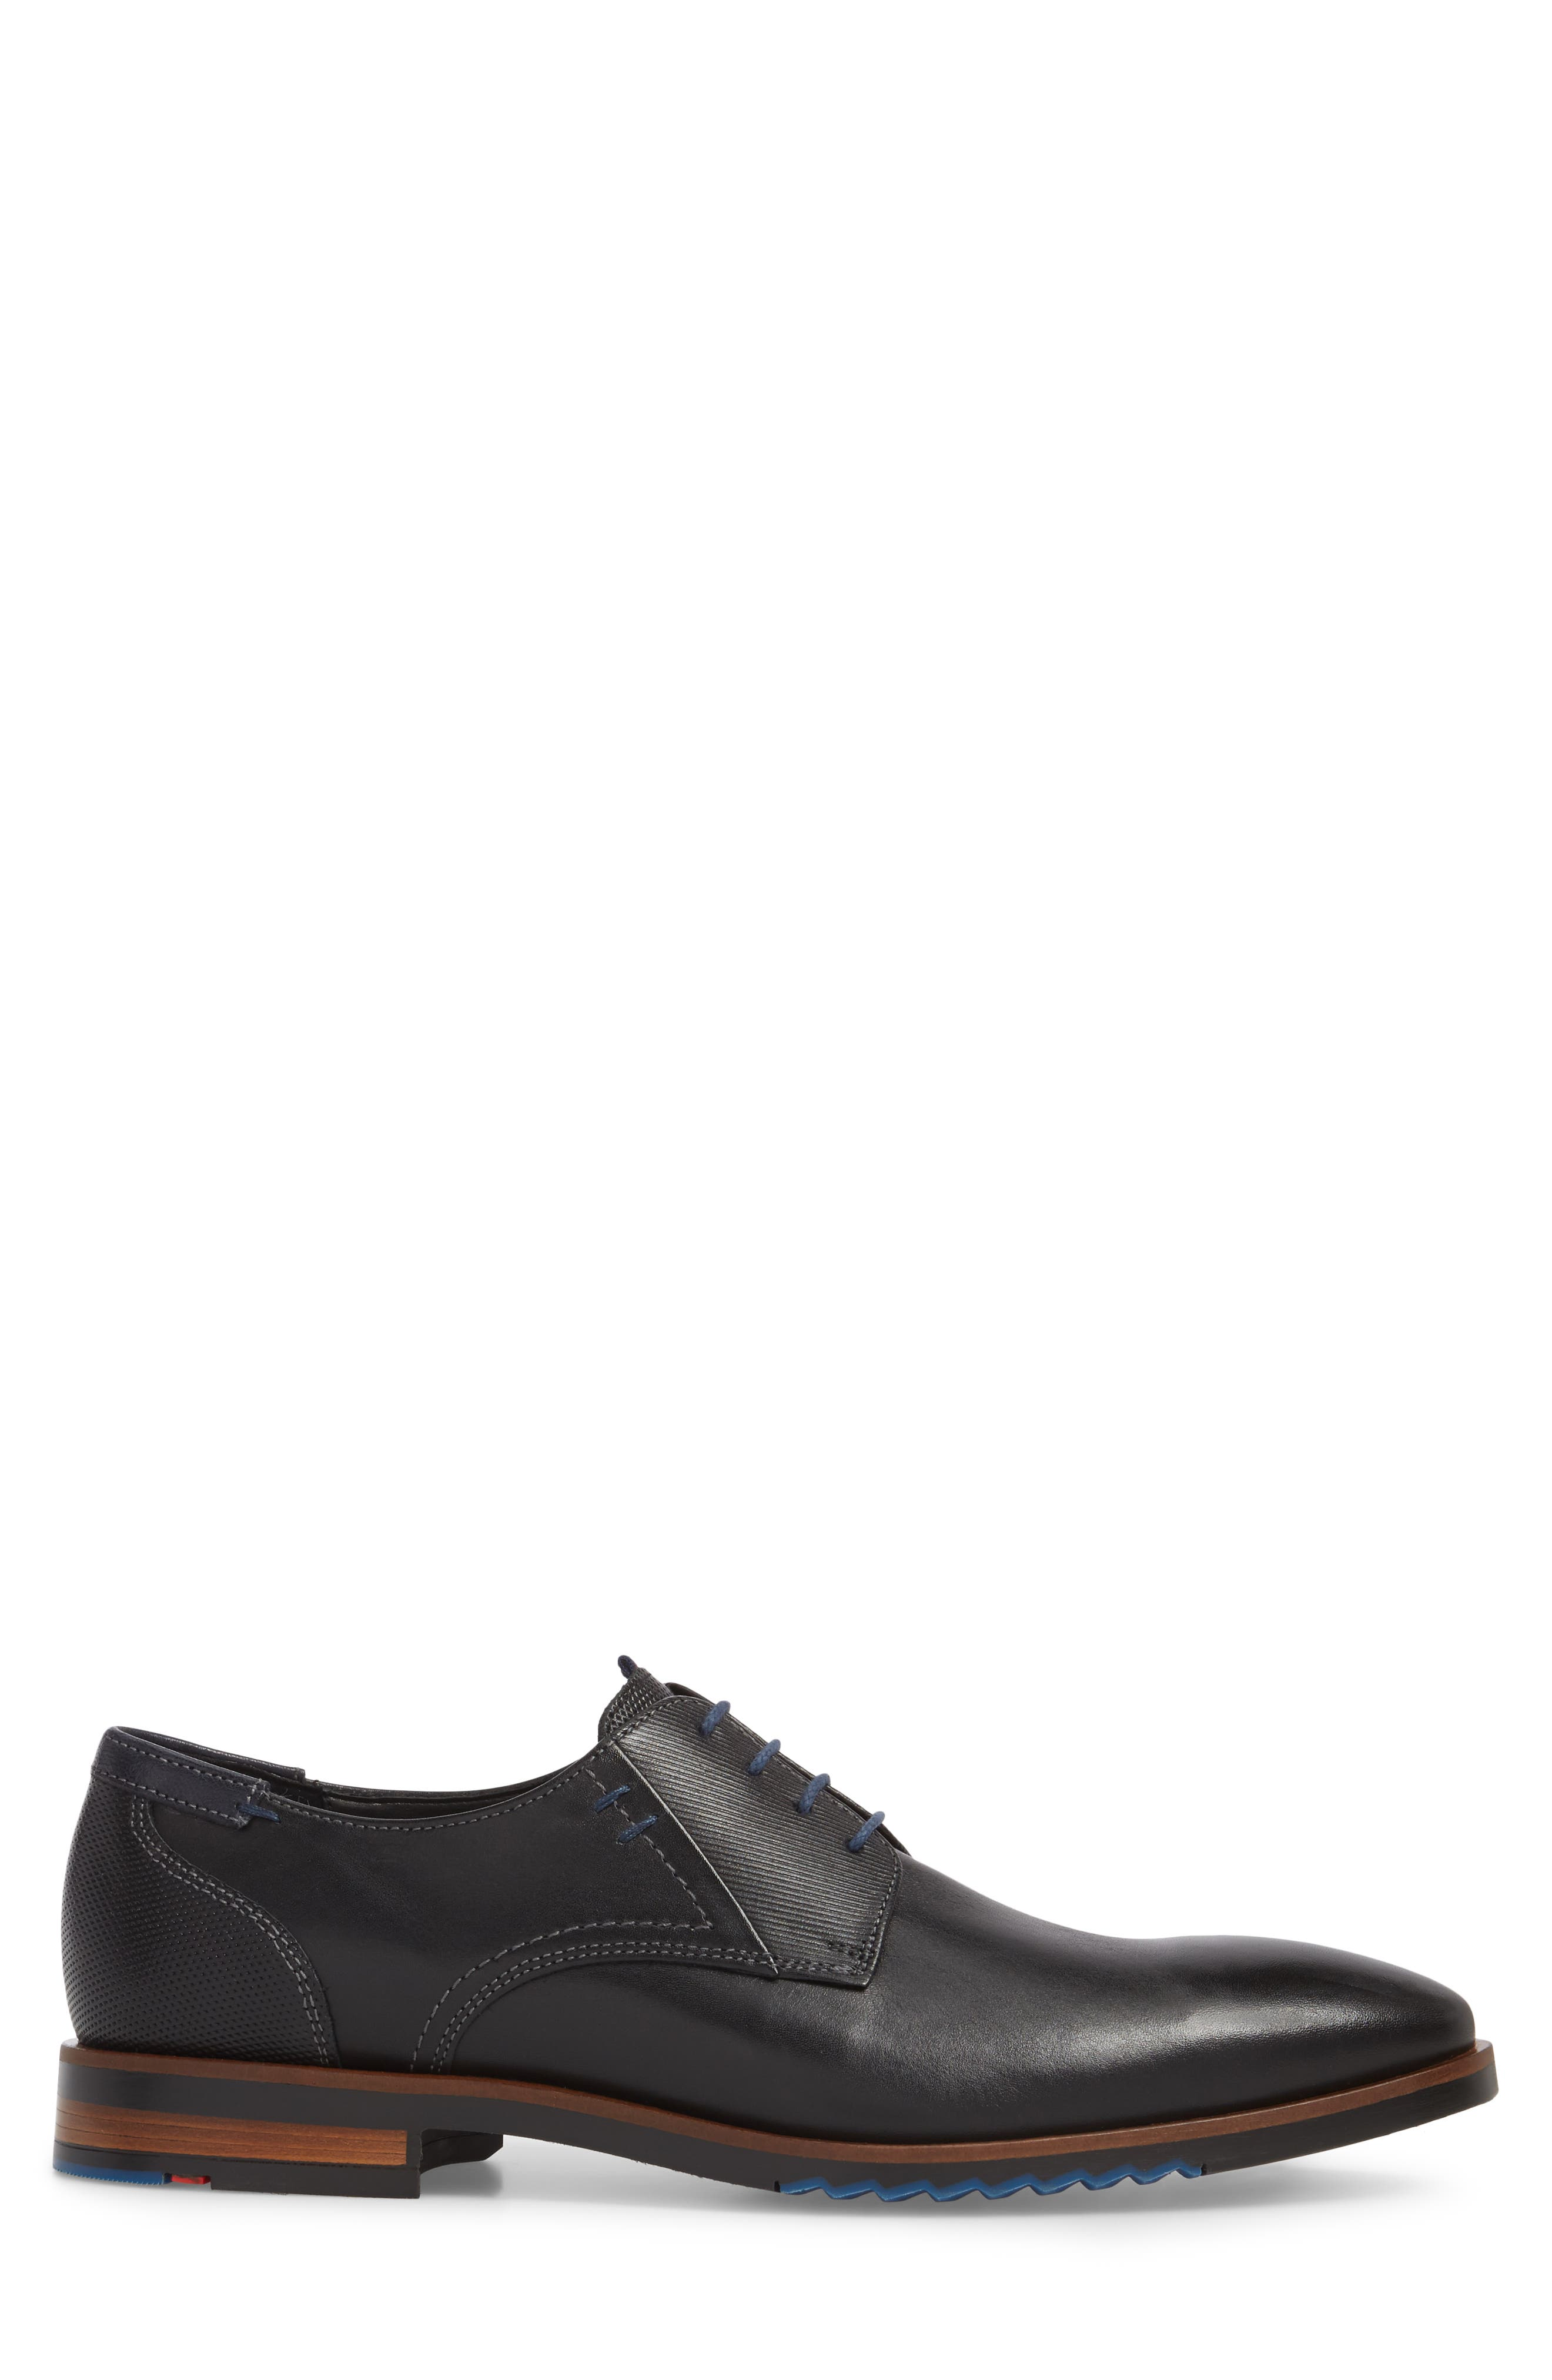 Deno Plain Toe Derby,                             Alternate thumbnail 3, color,                             Black/ Blue Leather